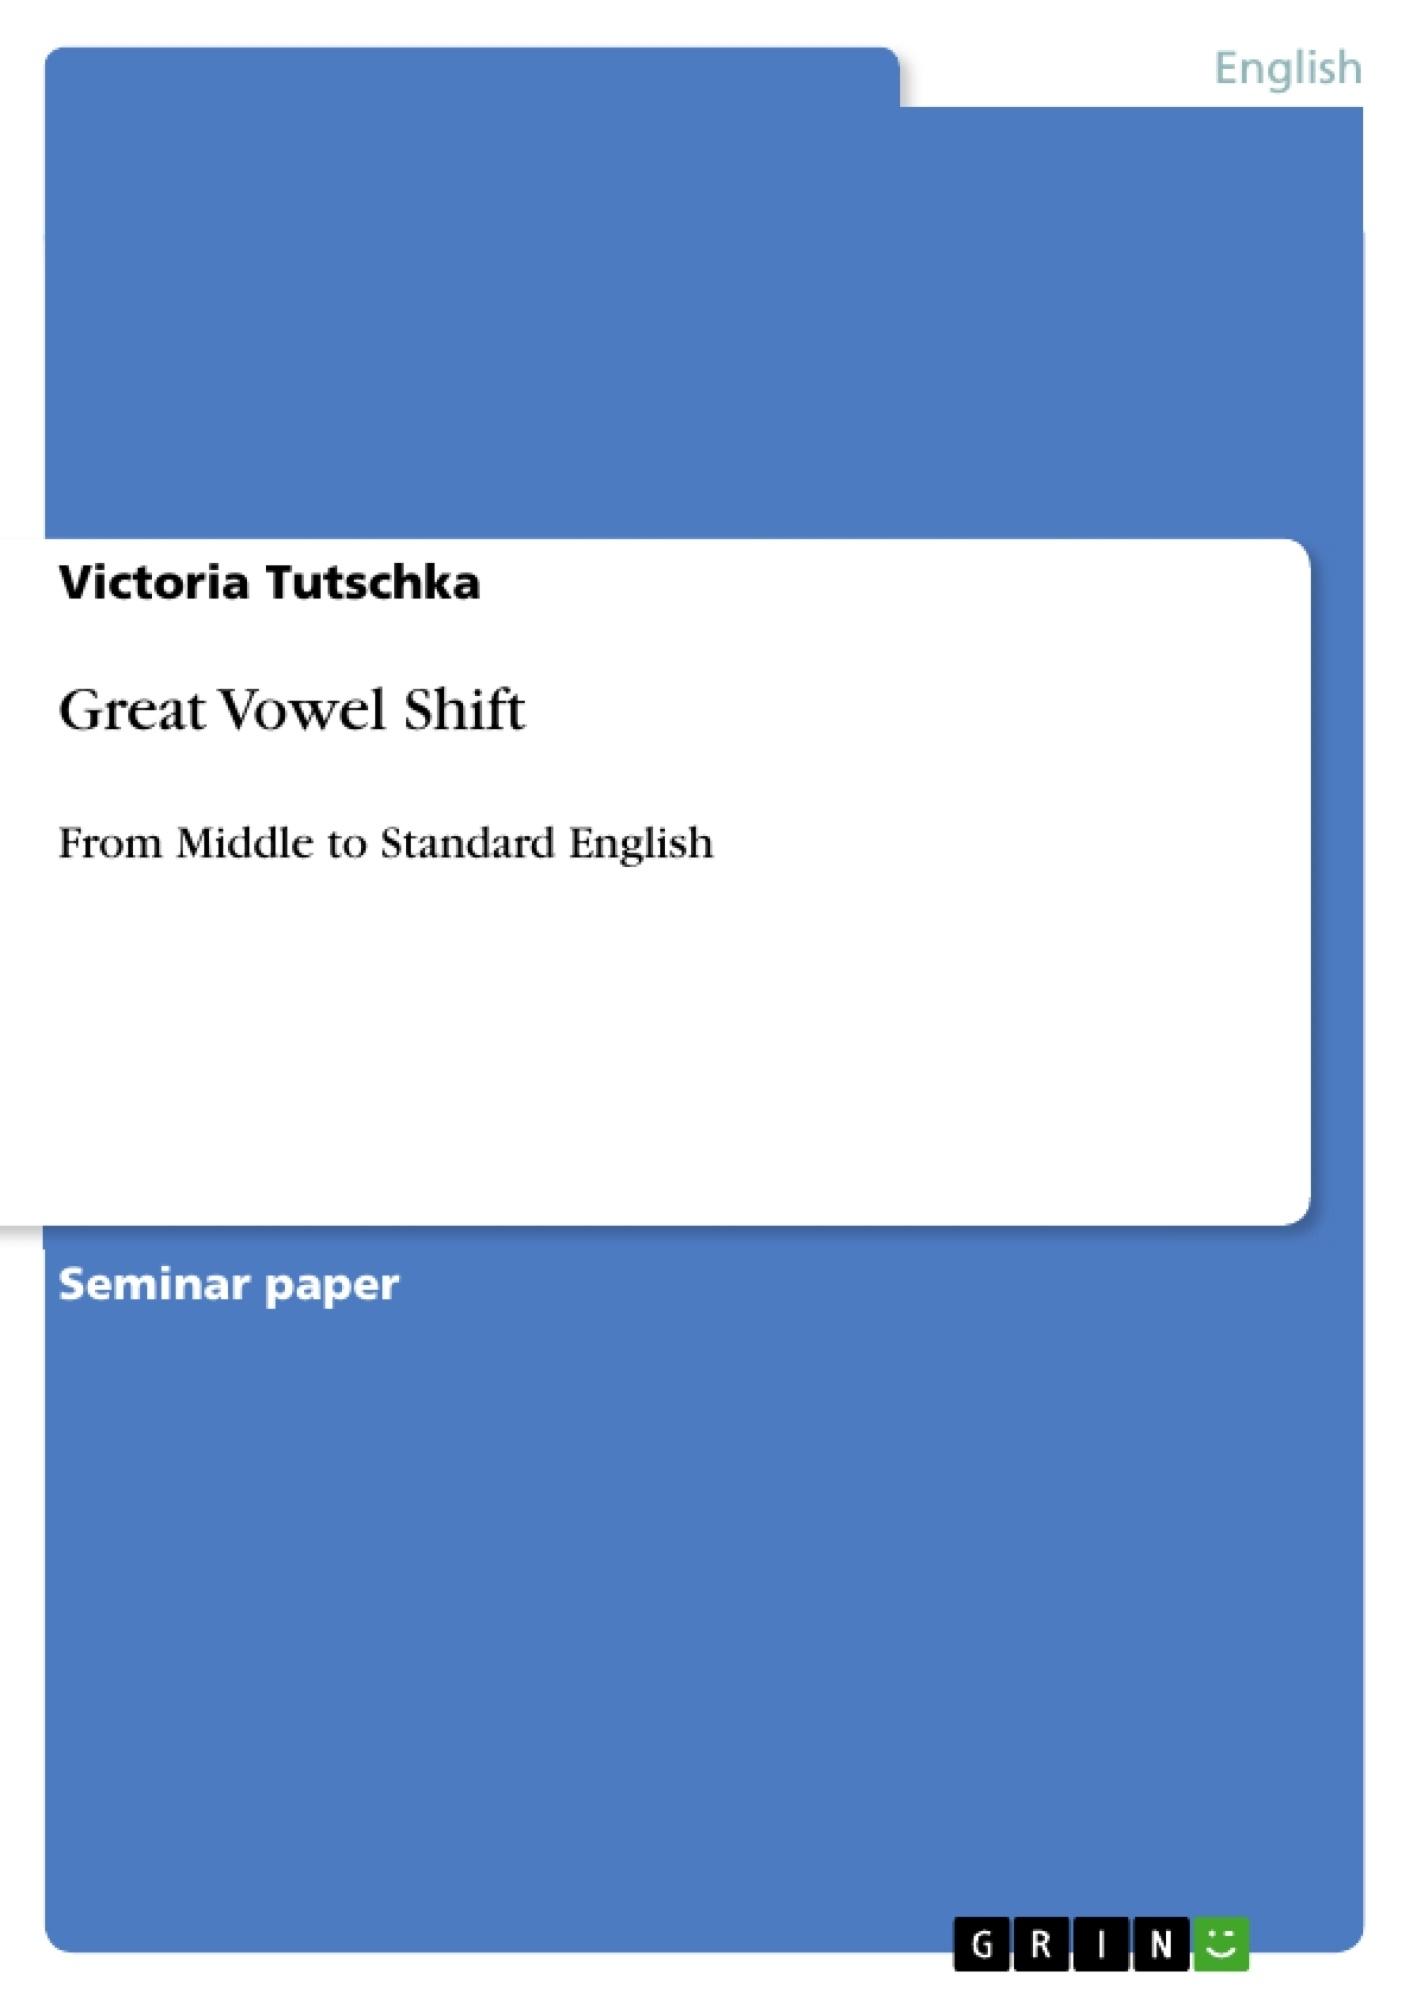 Title: Great Vowel Shift